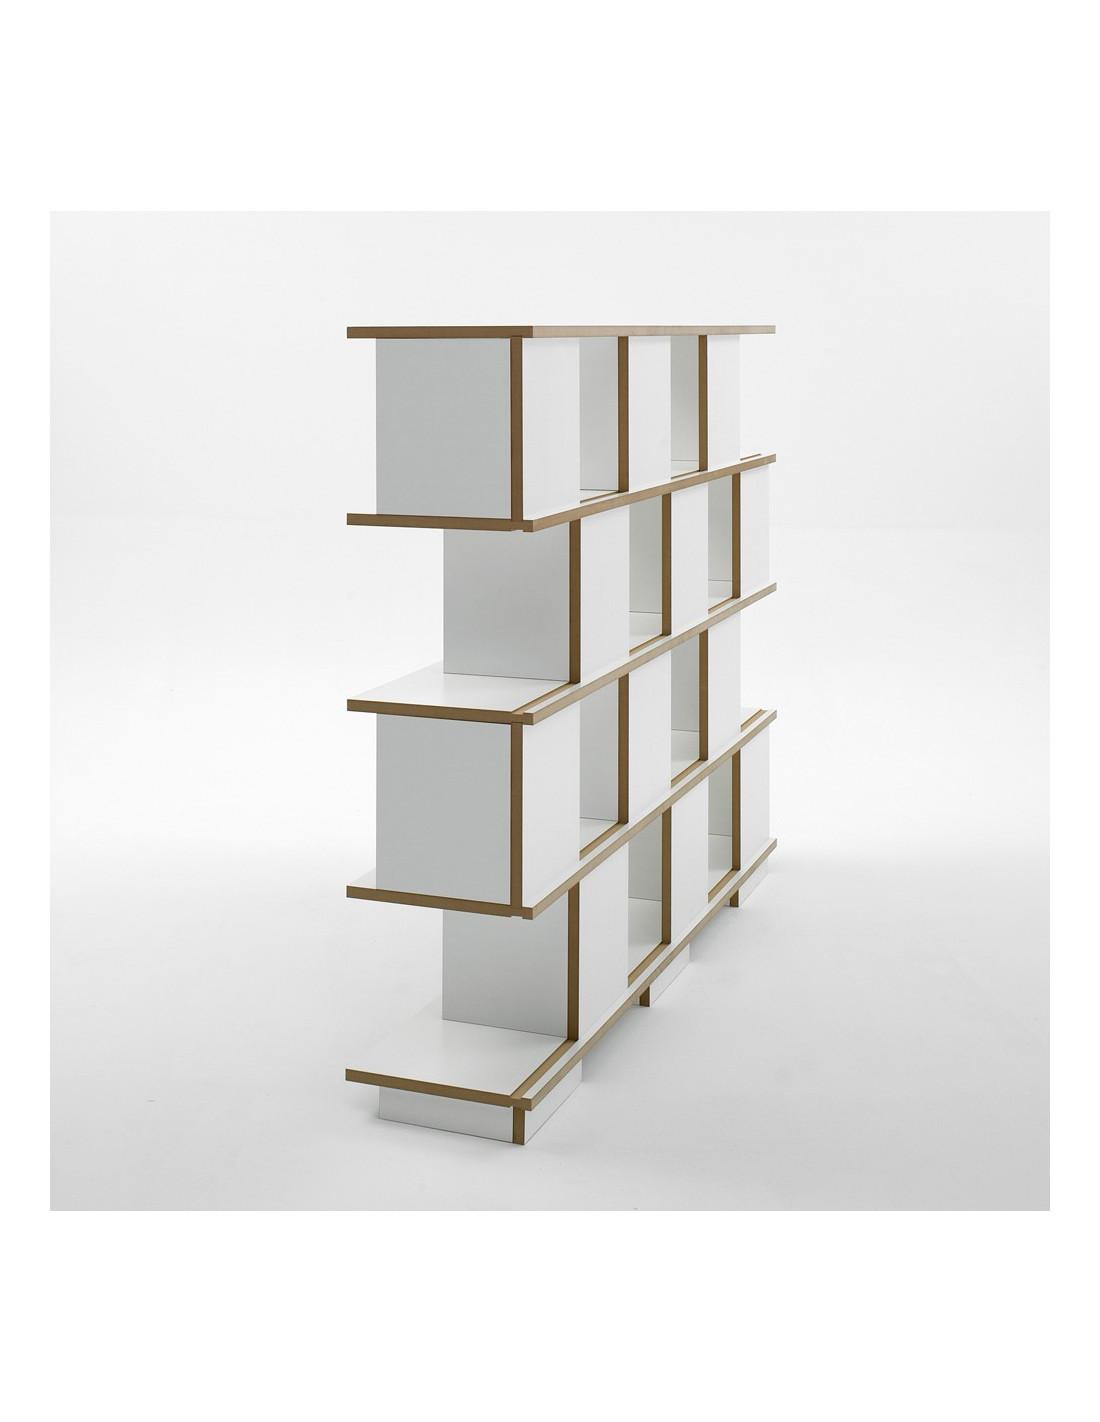 stell shelves la boutique danoise. Black Bedroom Furniture Sets. Home Design Ideas